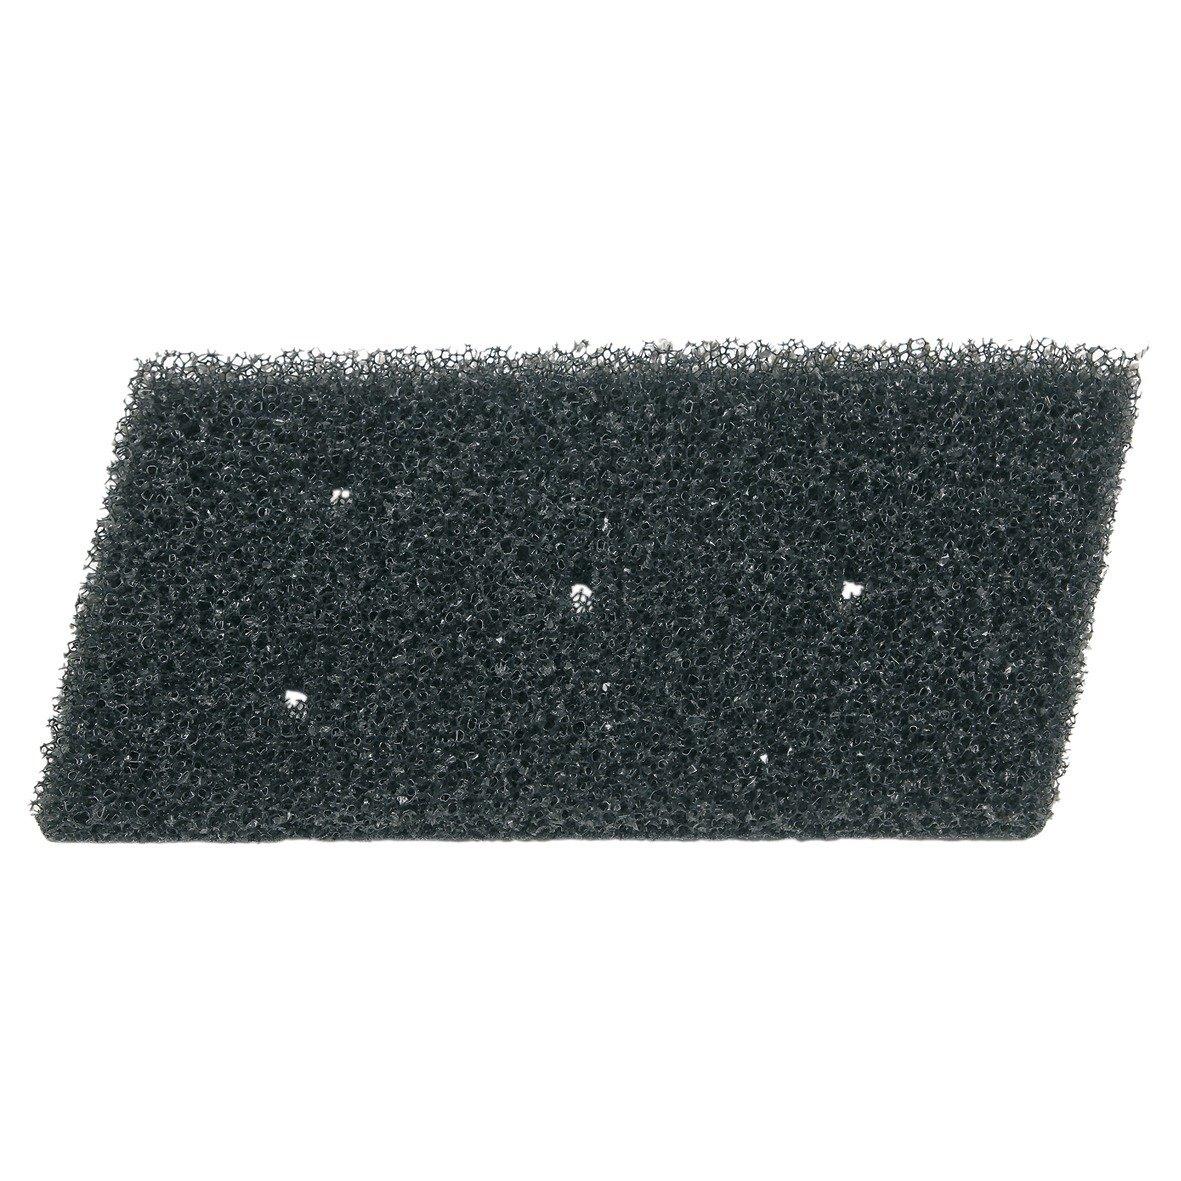 1X Filtro Filtro essiccatore Bauknecht Whirlpool 481010716911 Bauknecht Hausgeräte